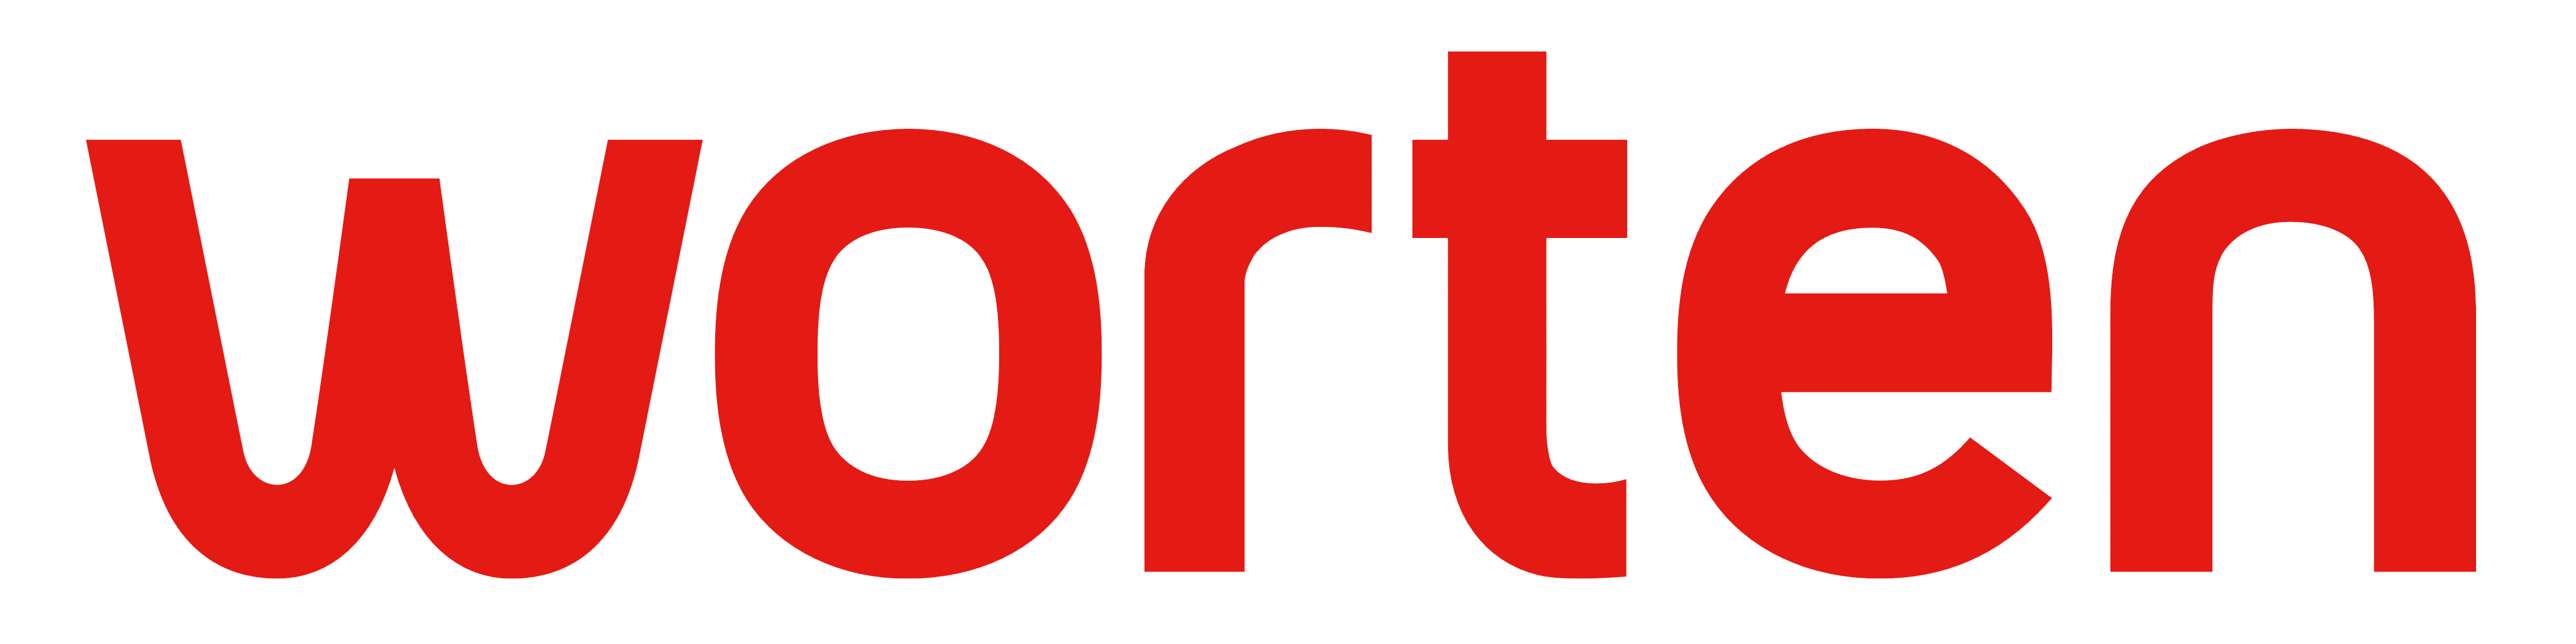 Worten logo